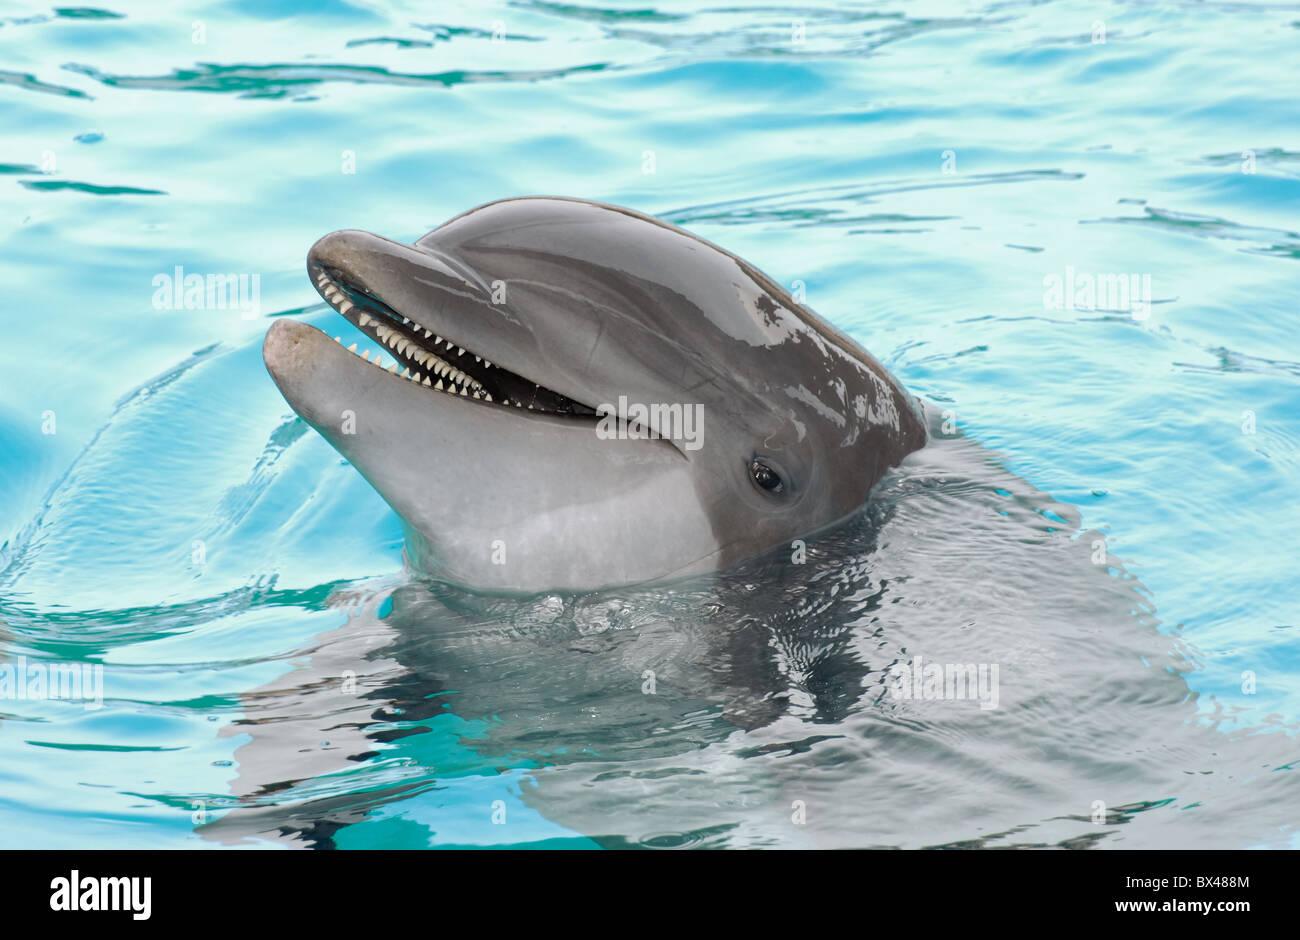 Dolphin - Stock Image